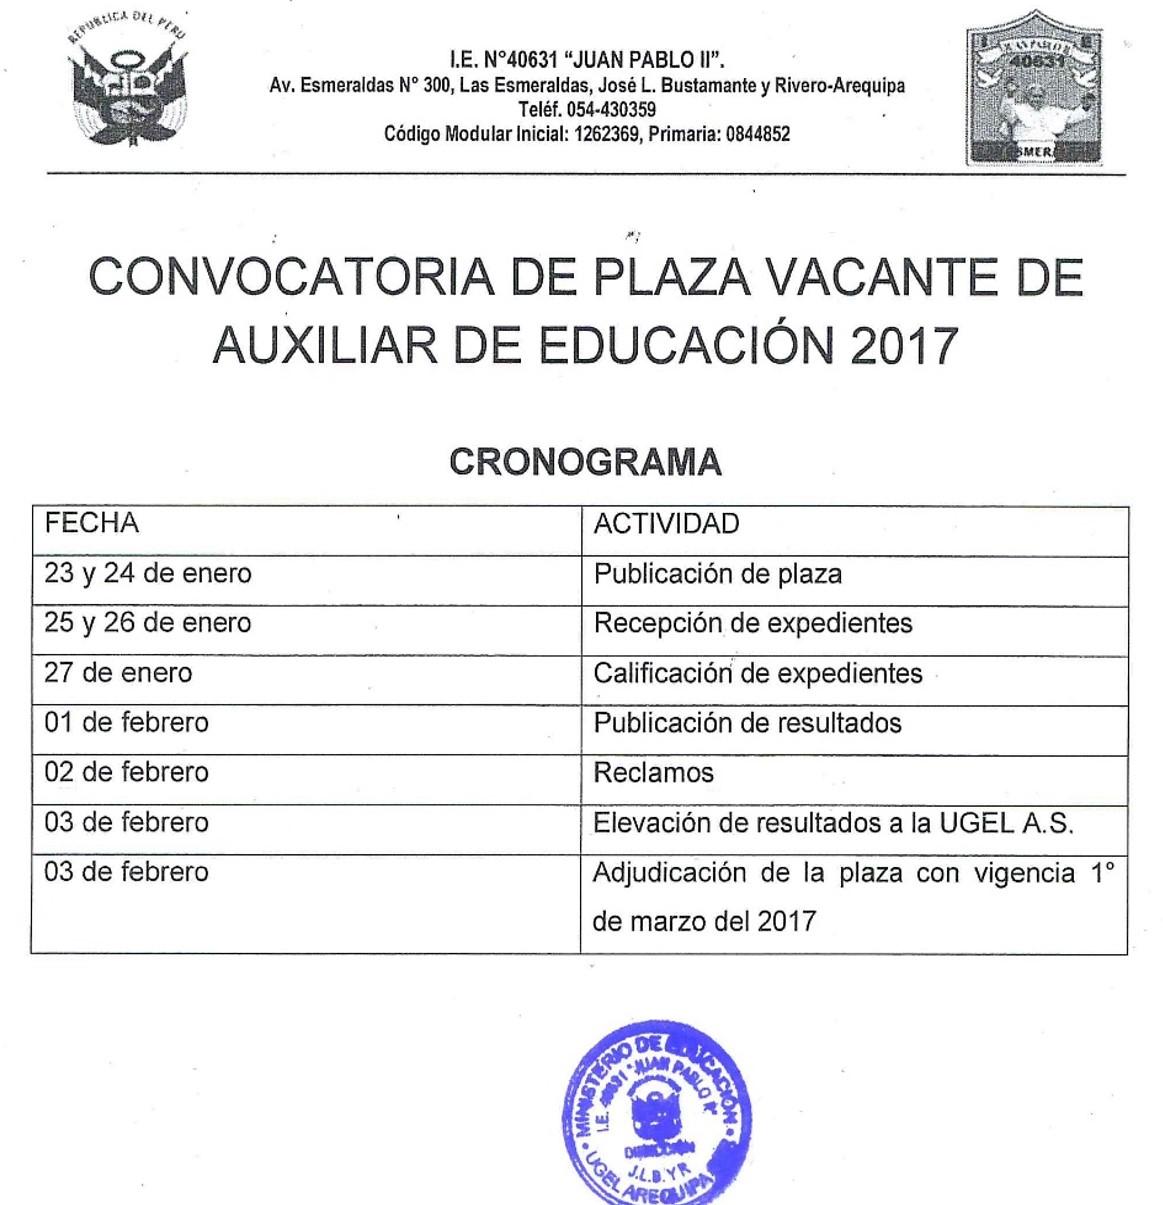 Convocatoria para plaza de auxiliar de educaci n 2017 i for Convocatoria de plazas docentes 2017